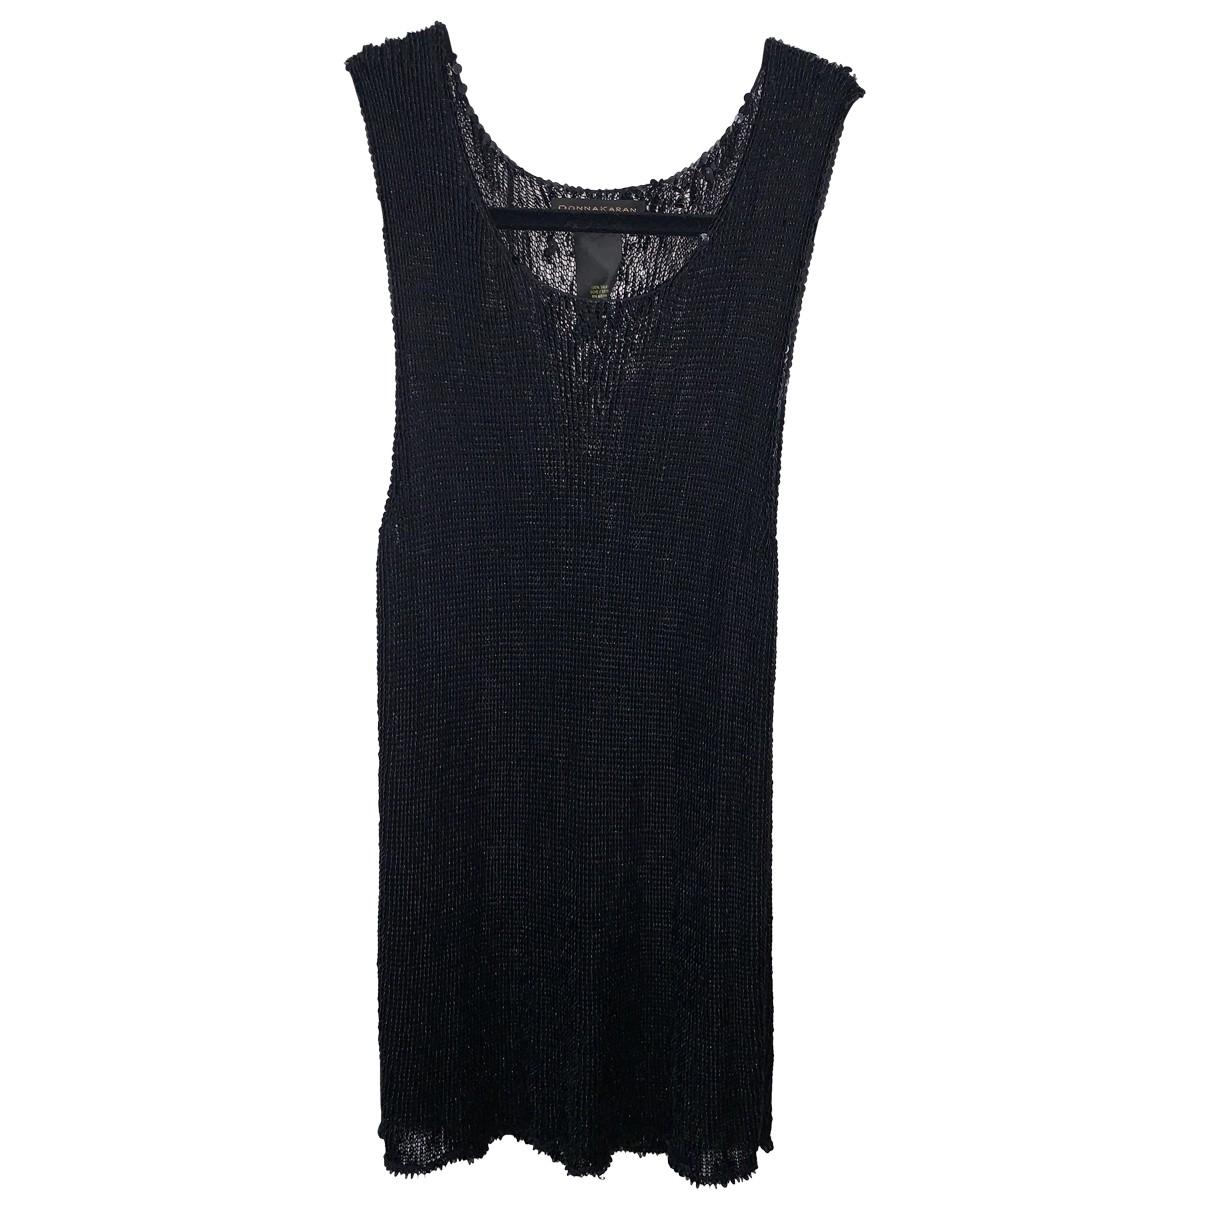 Donna Karan \N Black Glitter  top for Women M International